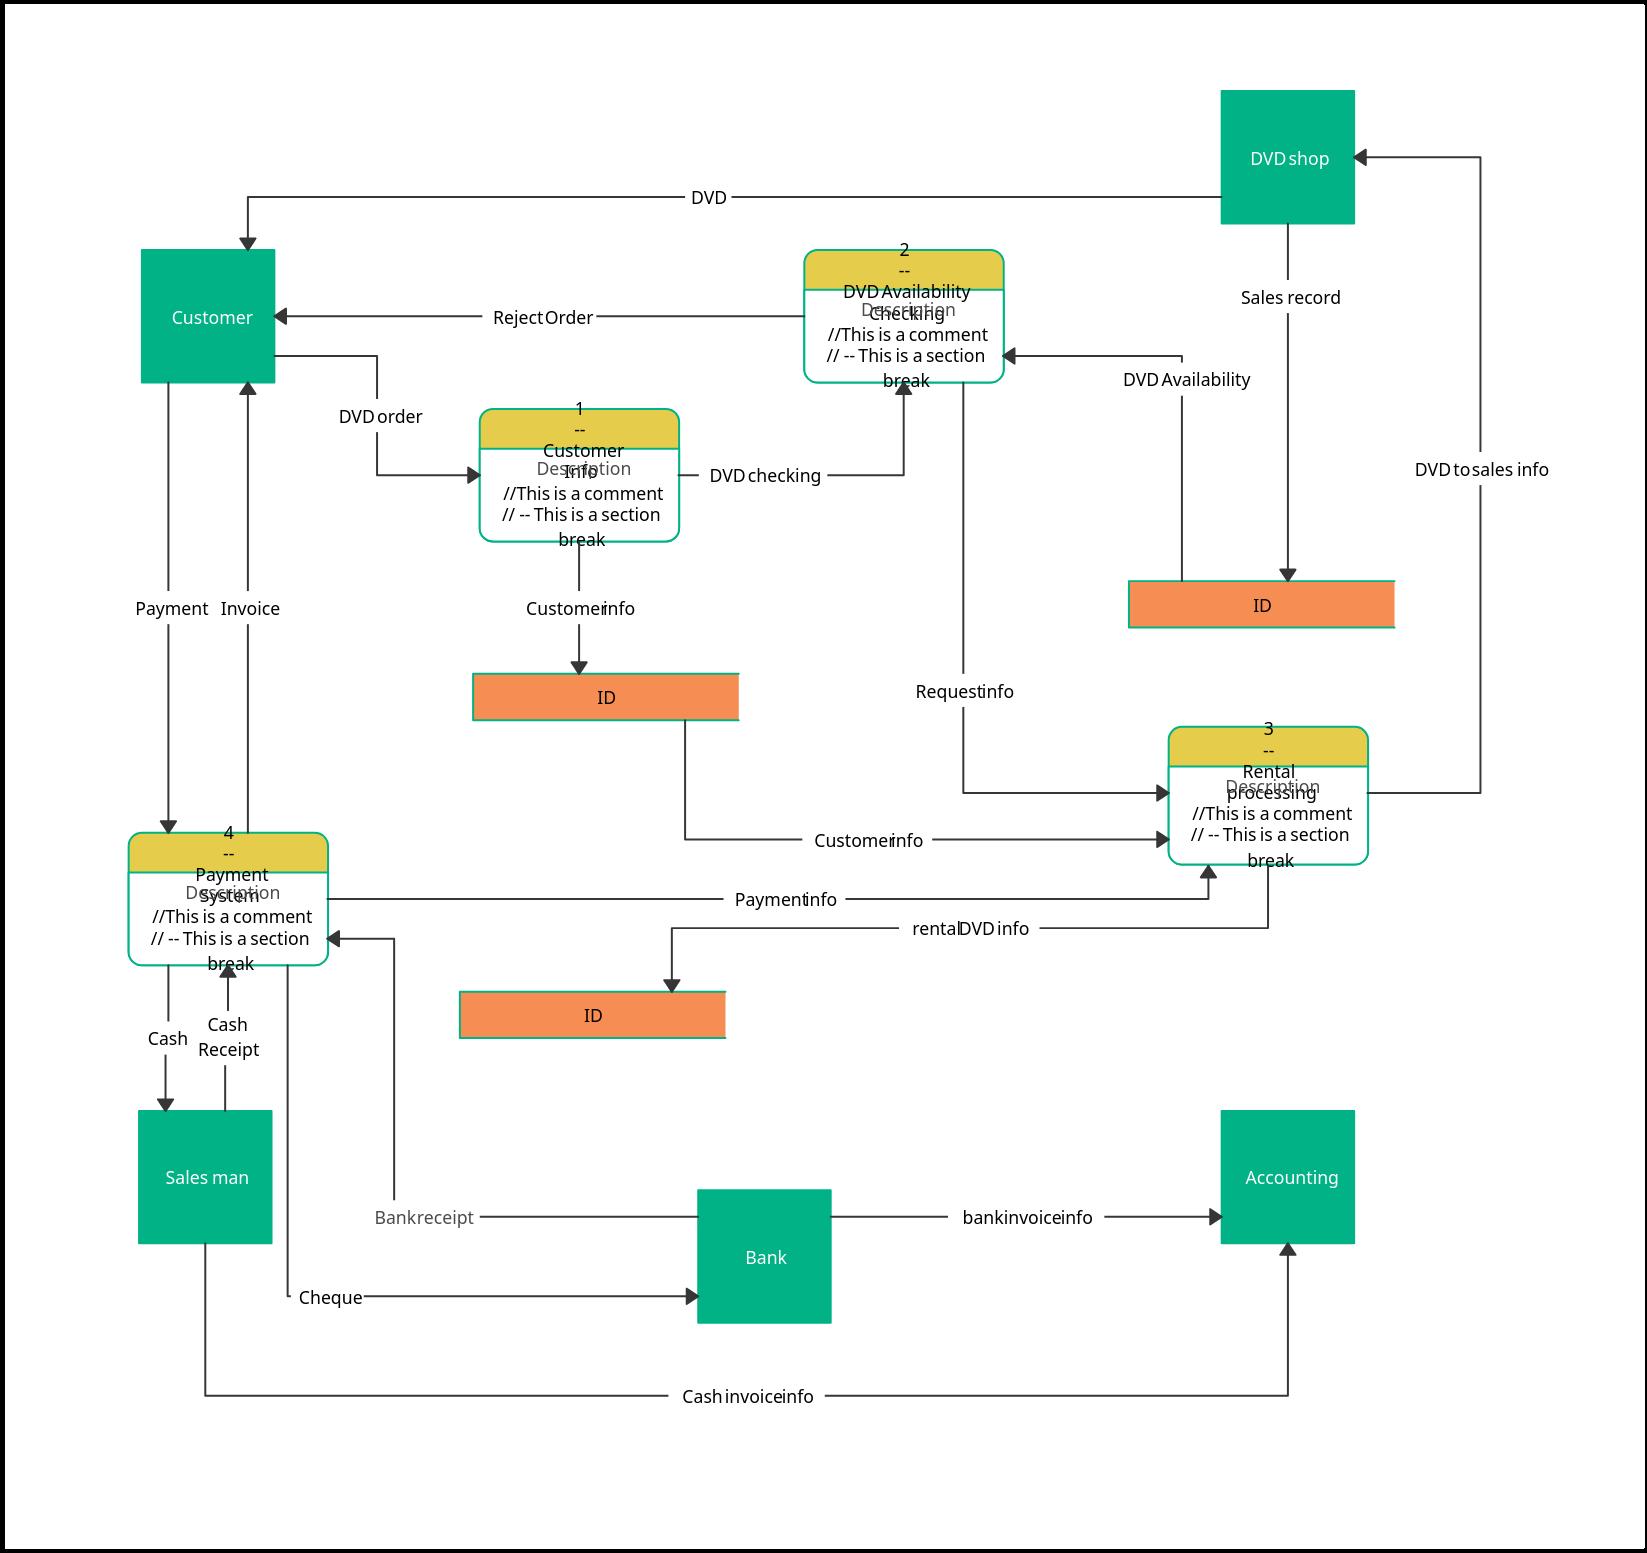 DVD Rental System - Data Flow